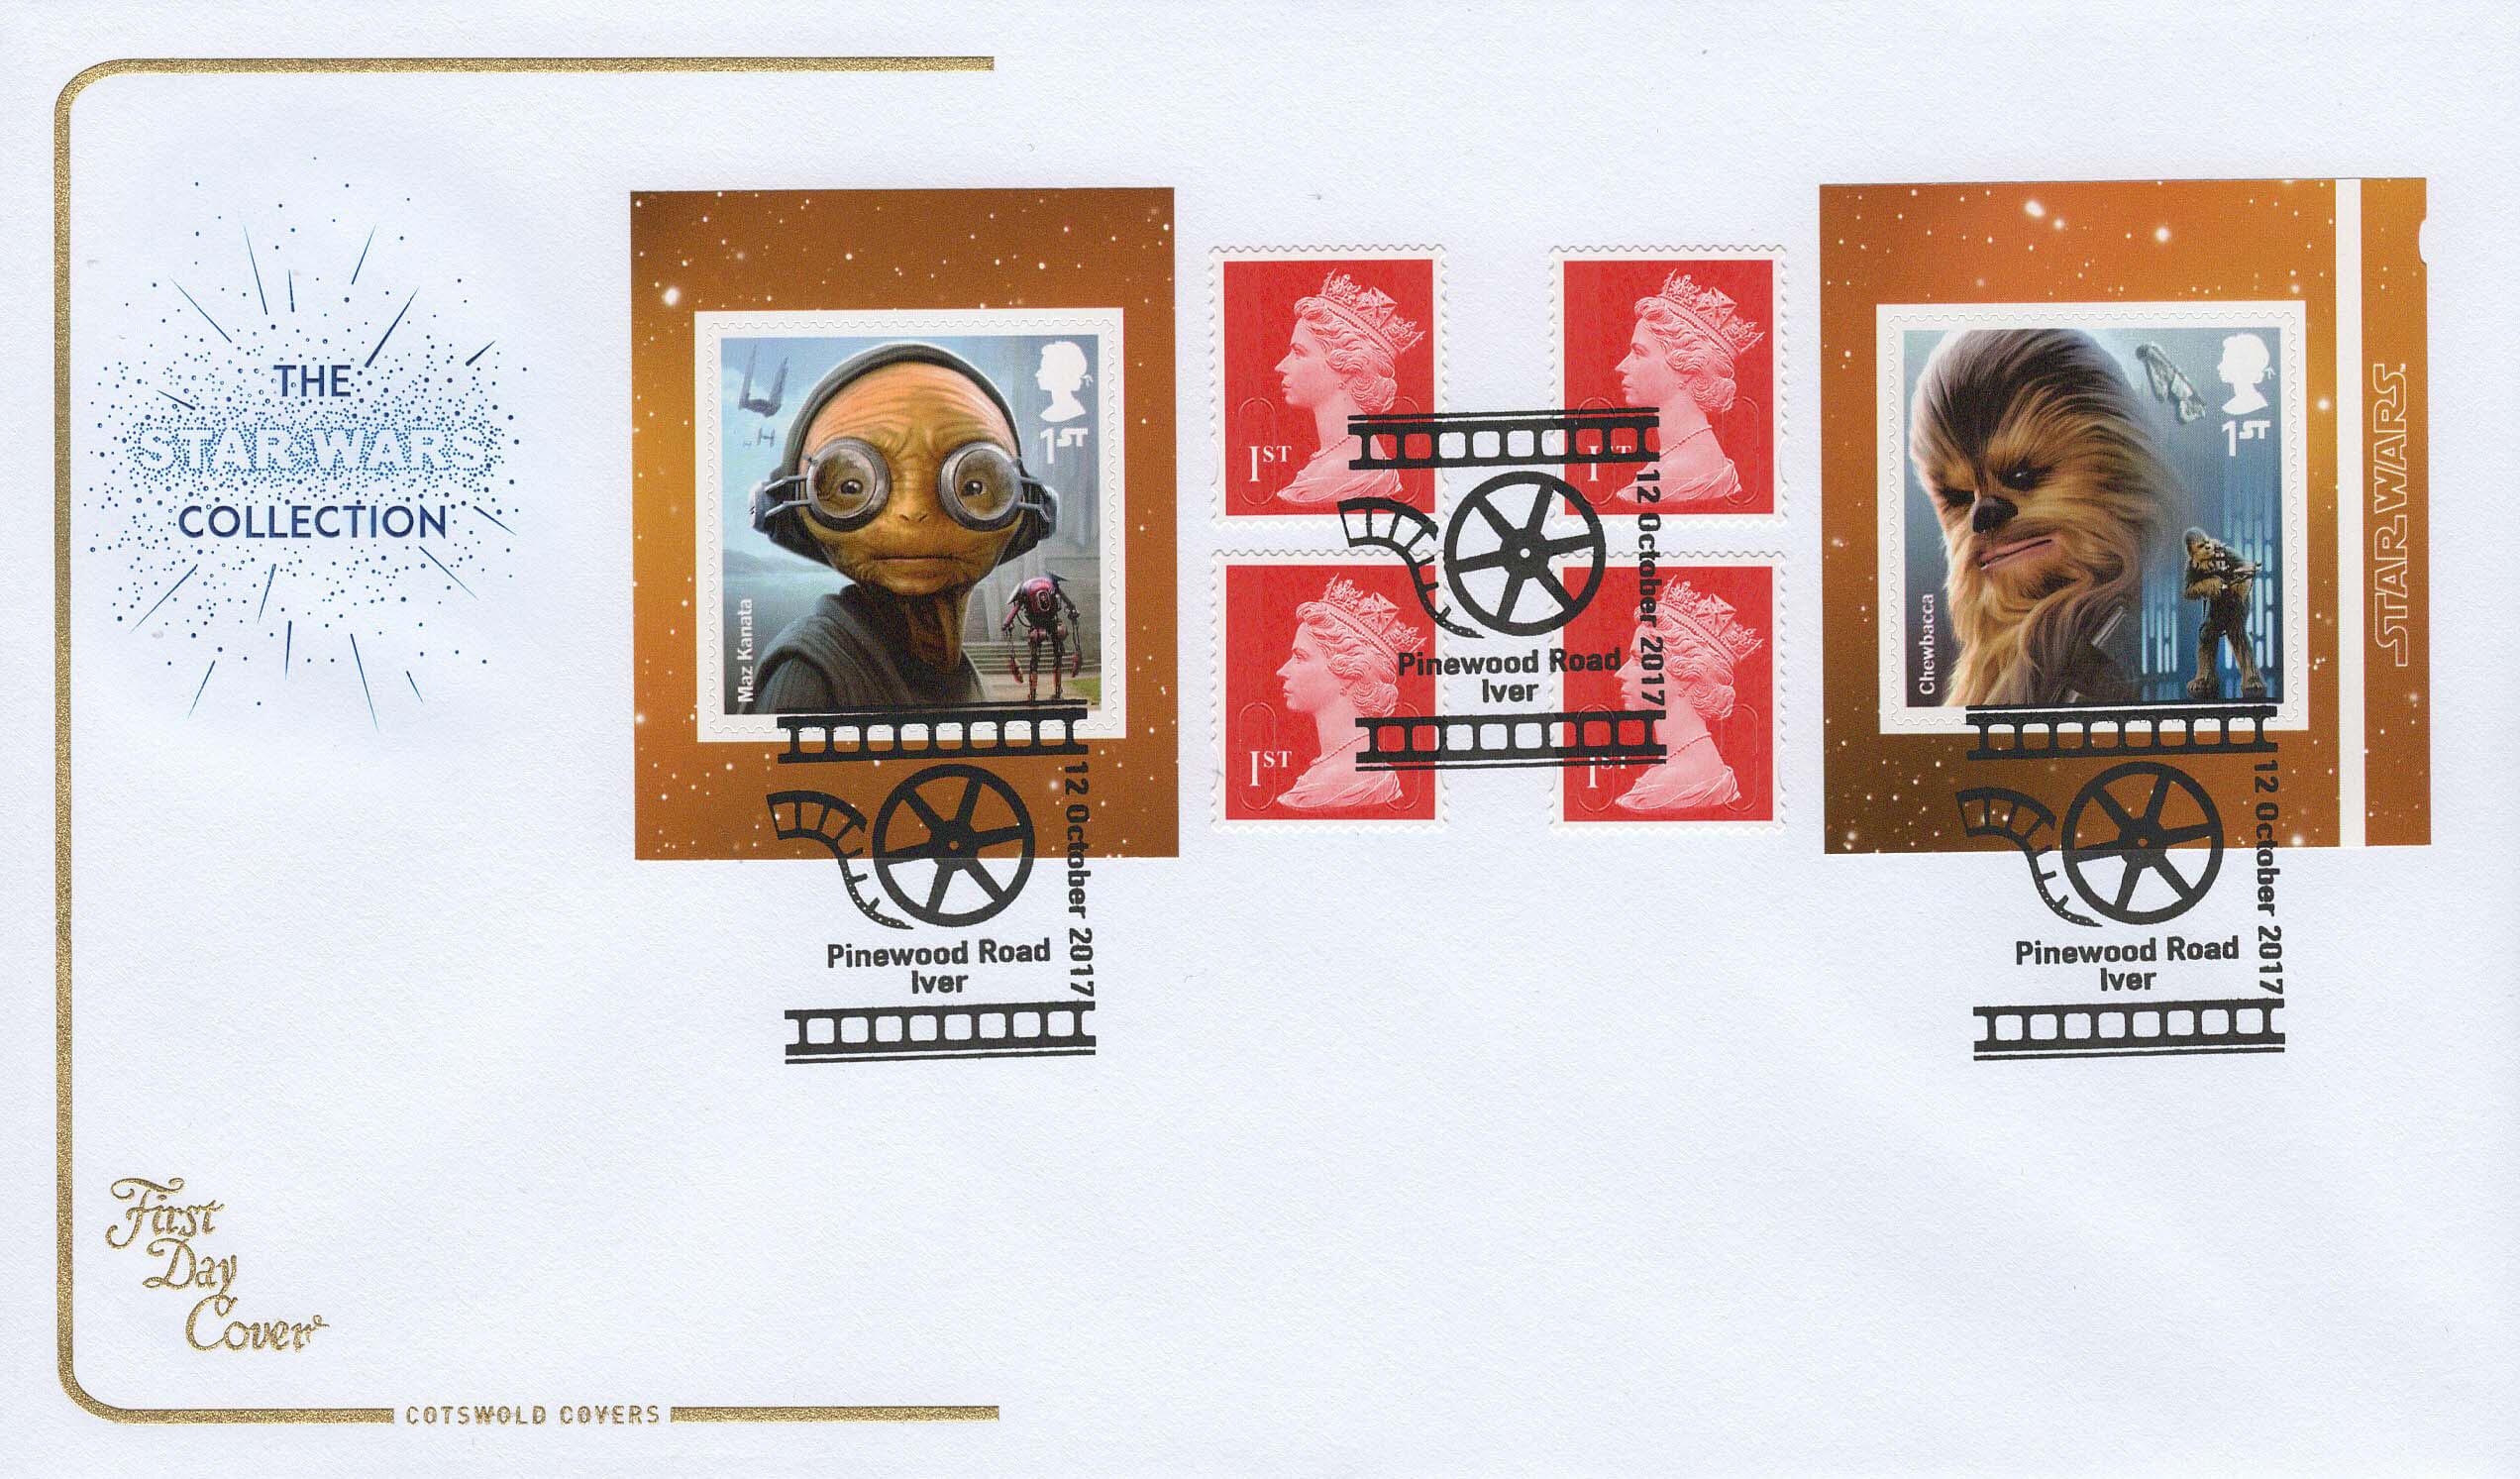 Star Wars Droids & Aliens | Cotswold Aliens Retail Booklet FDC